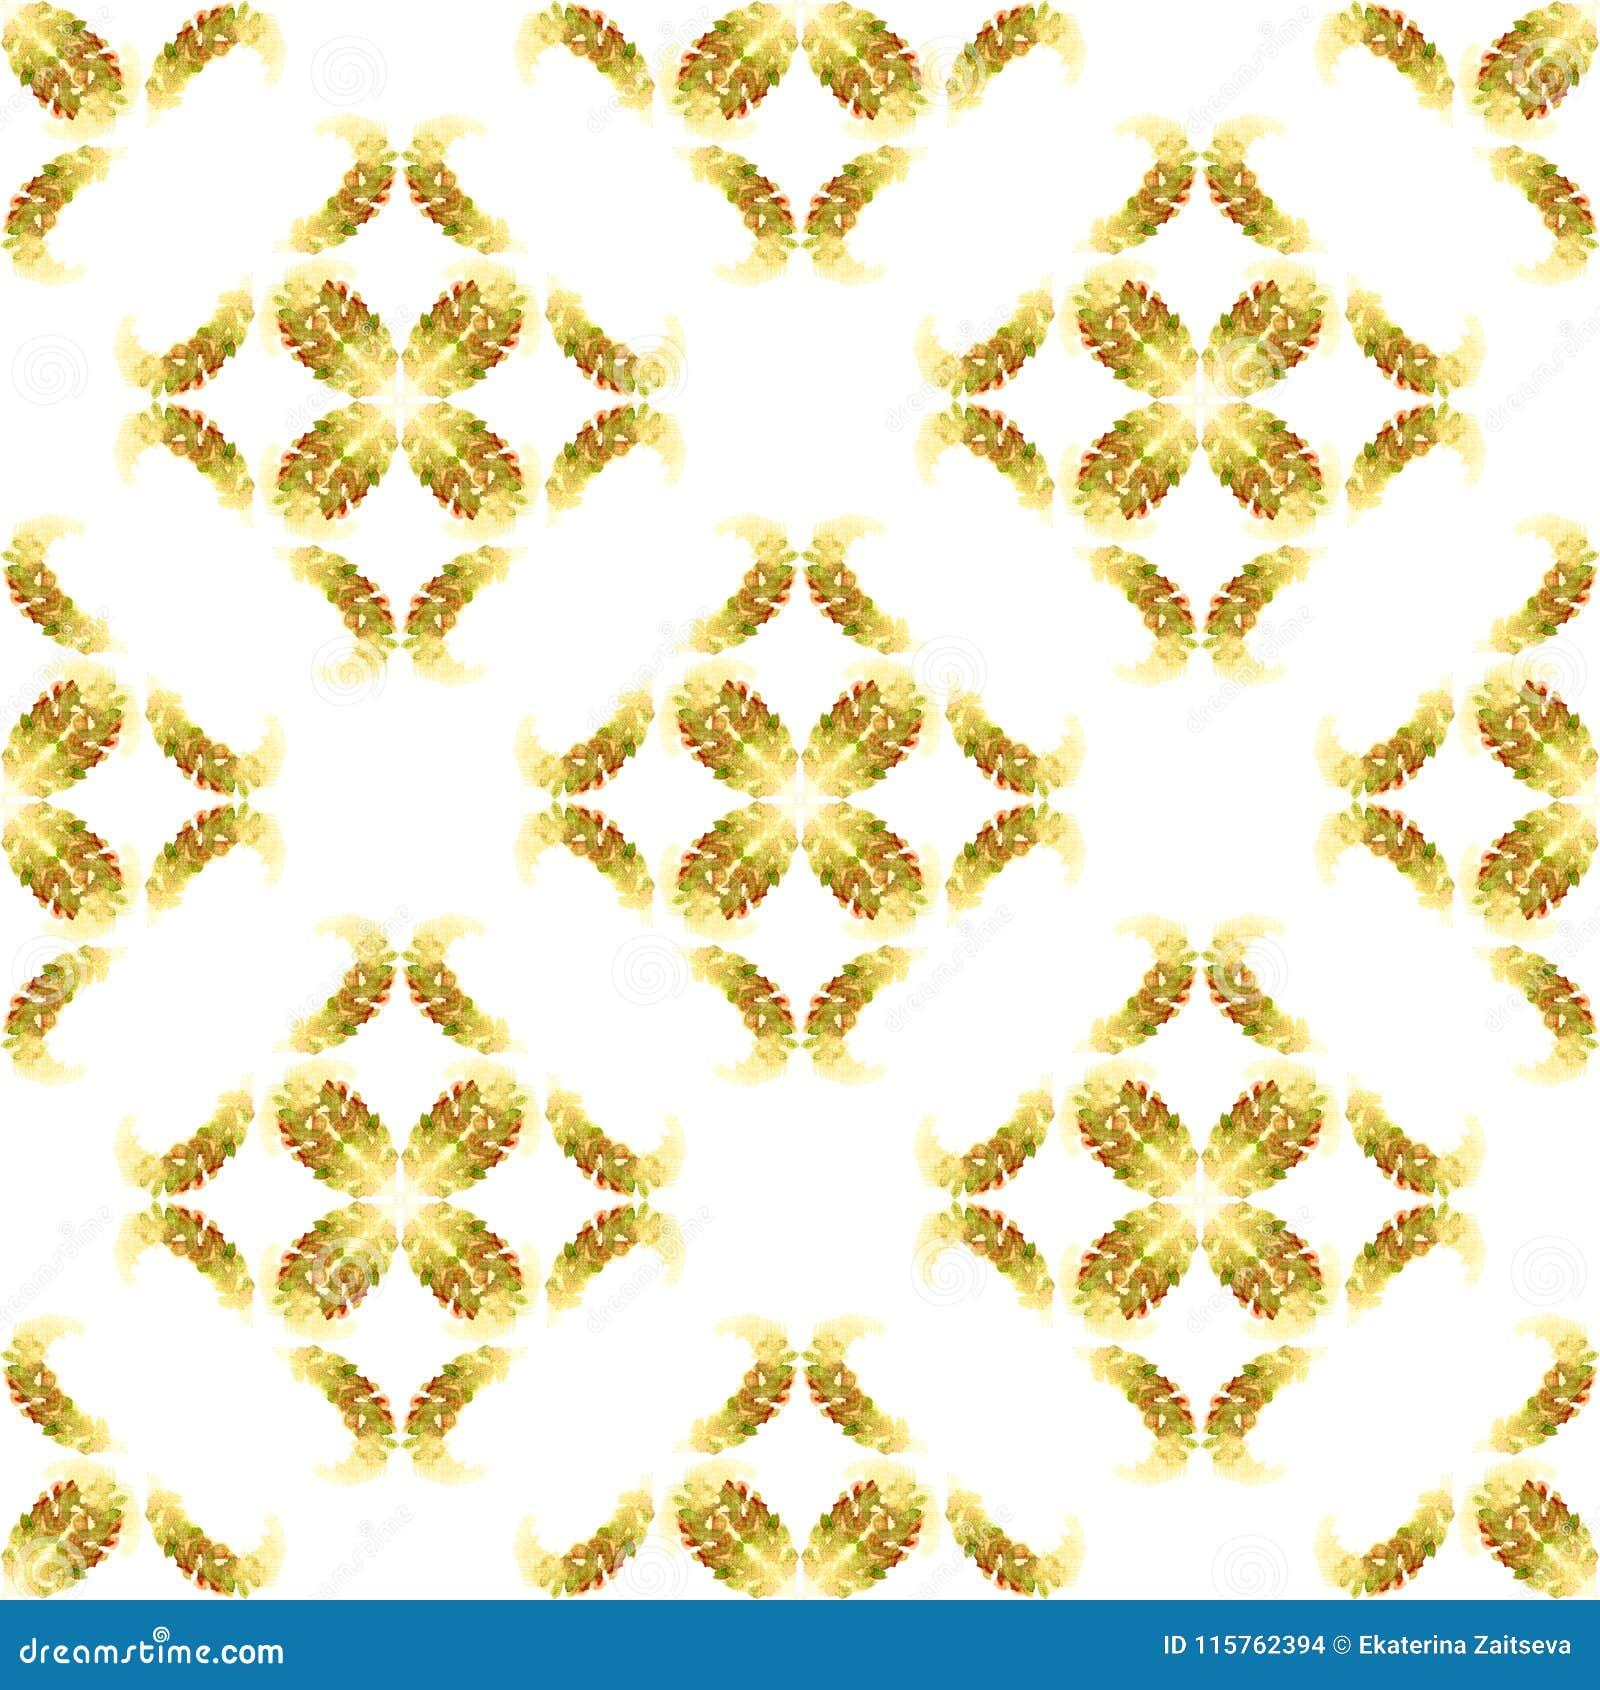 ears of corn pattern seamless beige golden brown autumn vintage